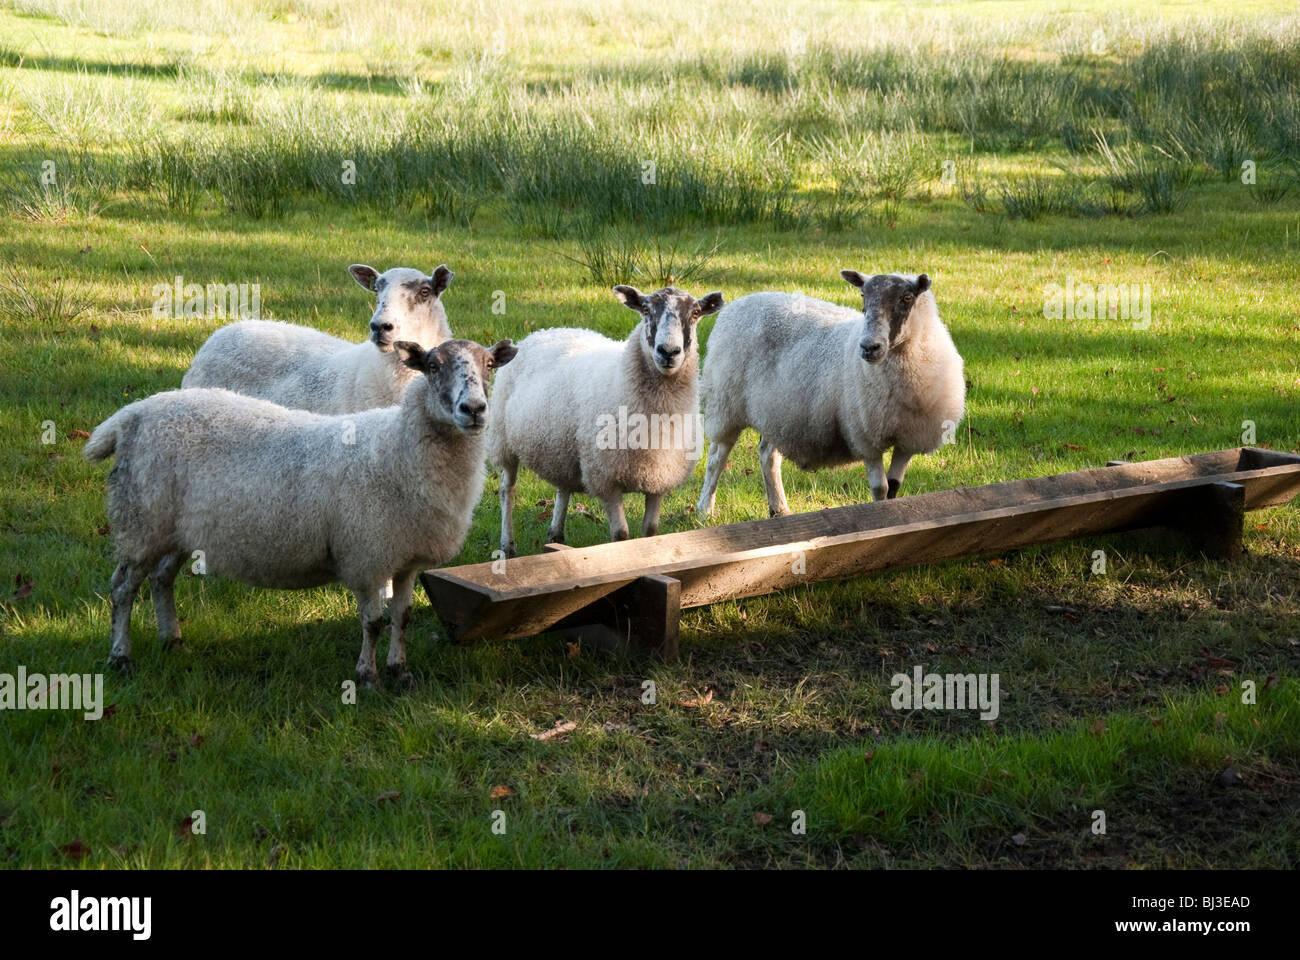 Sheep at the Trough - Stock Image